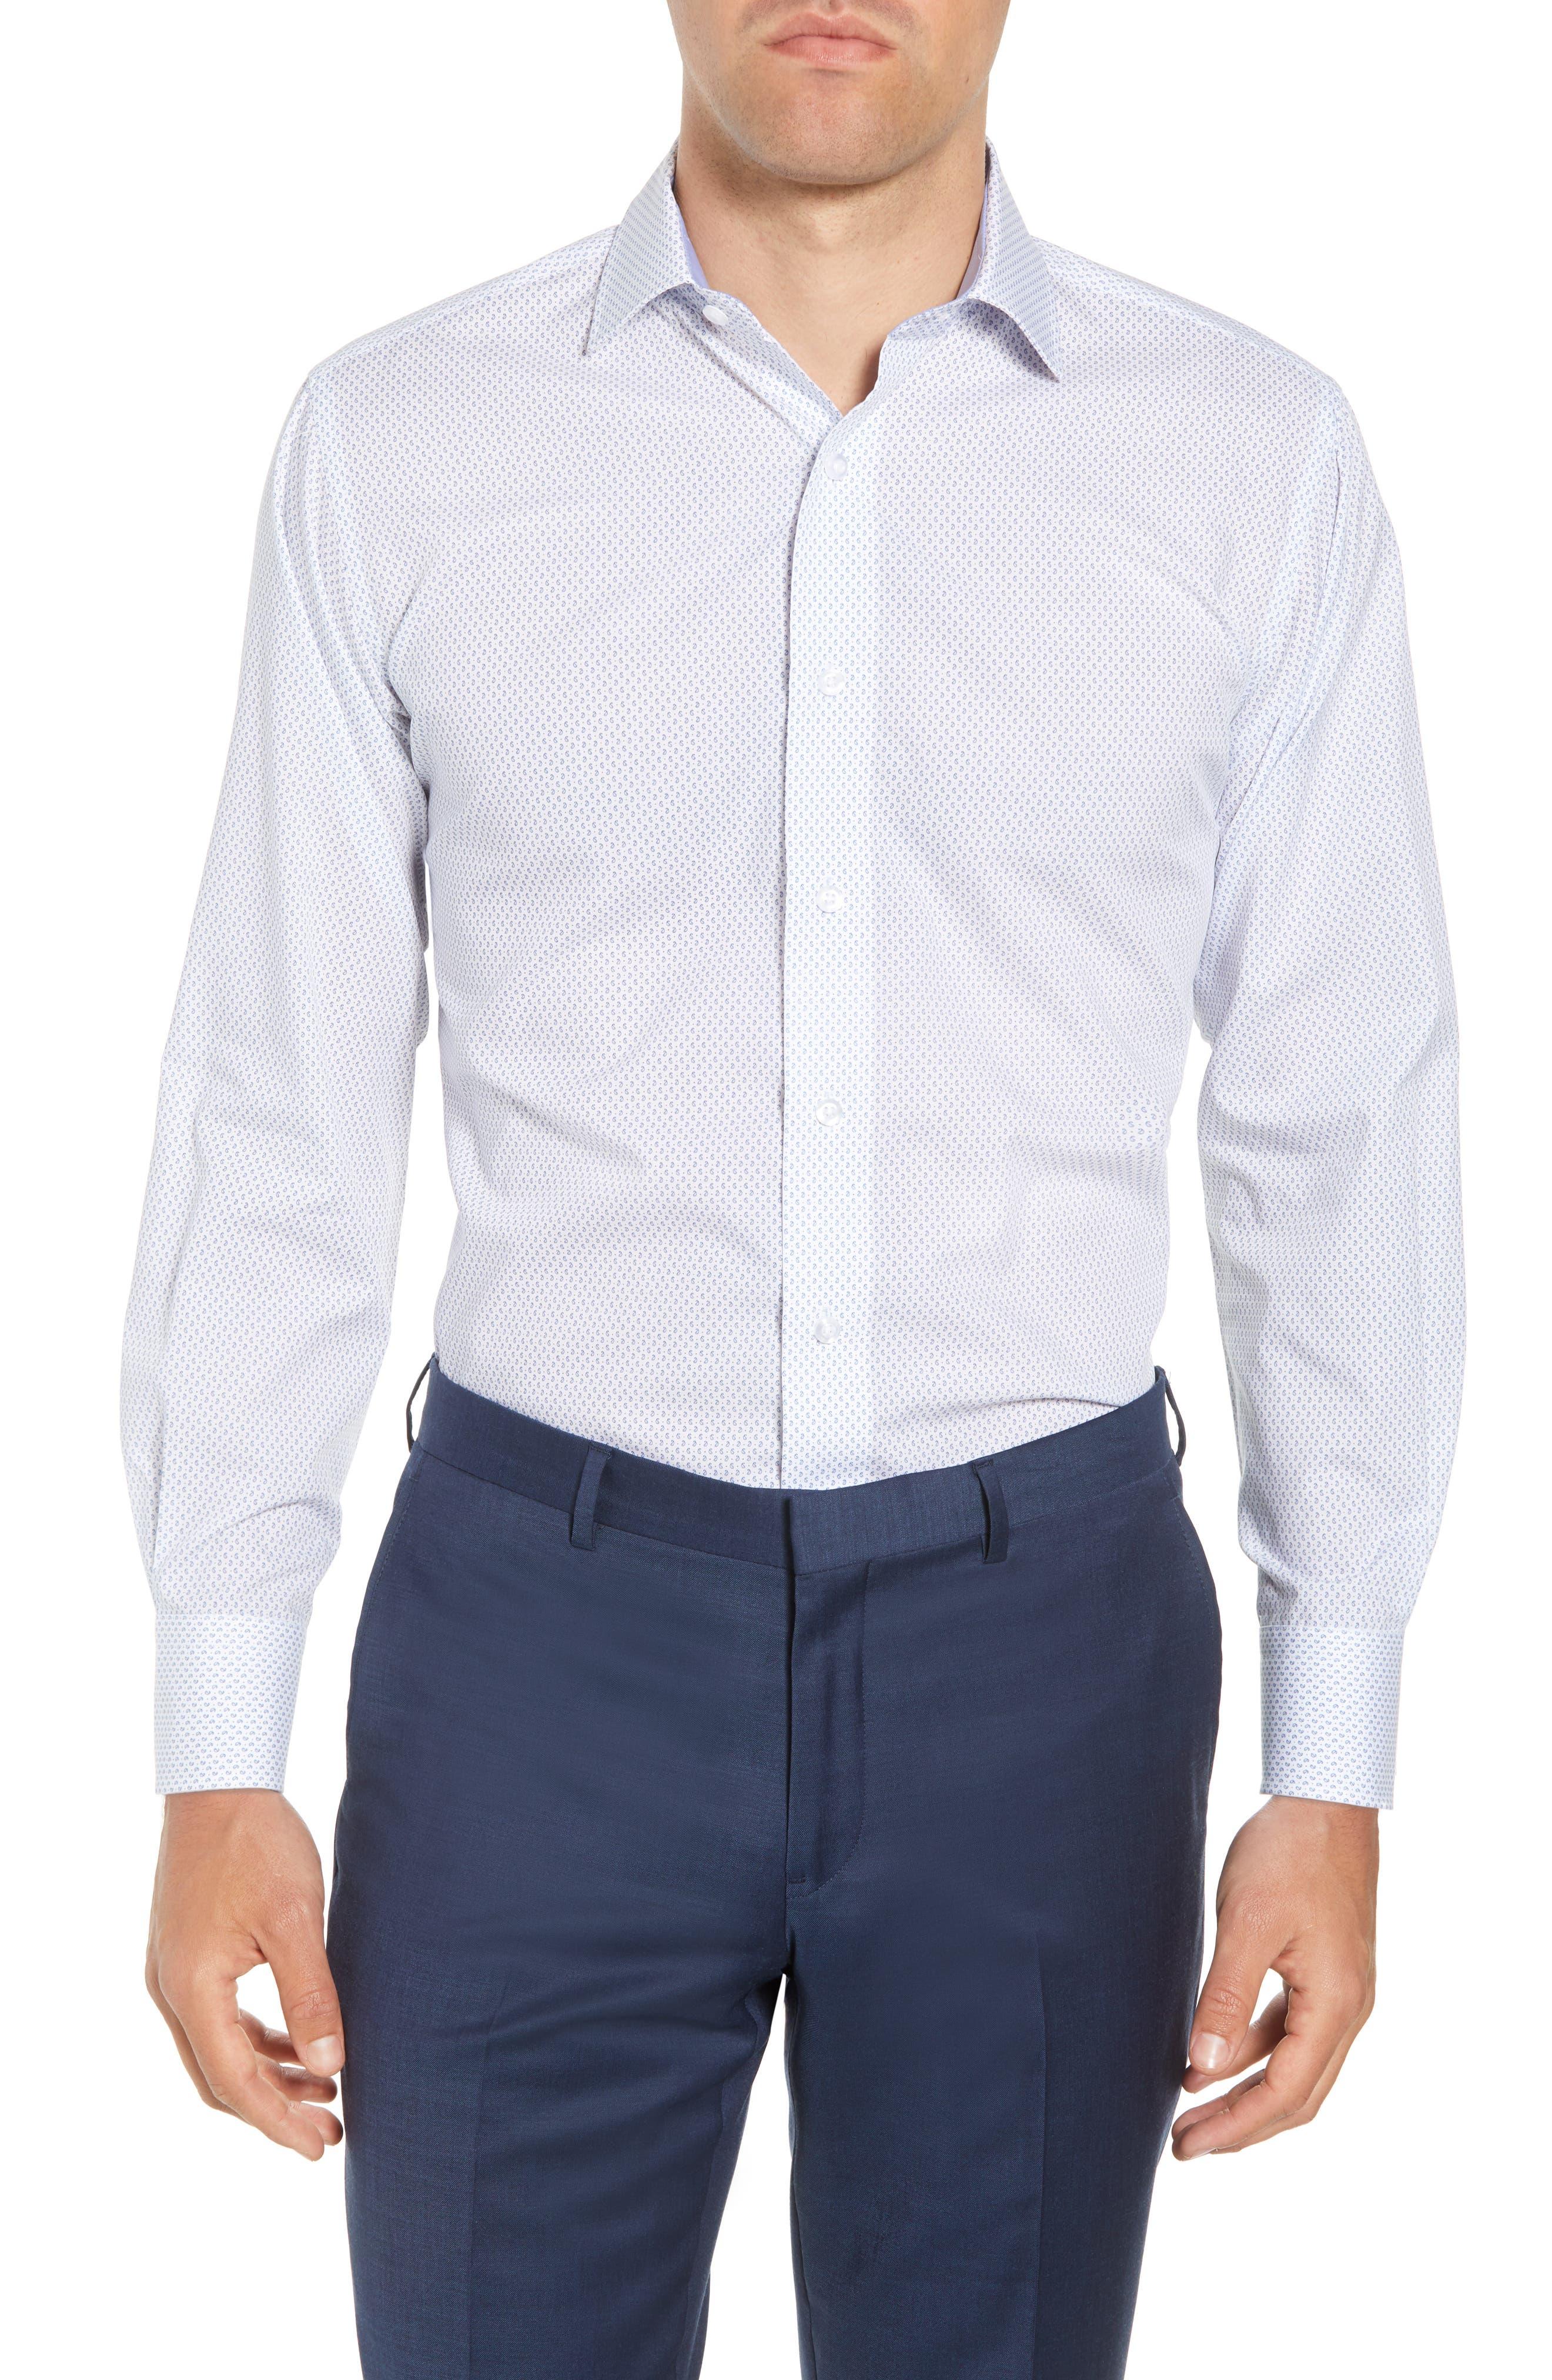 Trim Fit Paisley Dress Shirt,                             Main thumbnail 1, color,                             White/ Blue